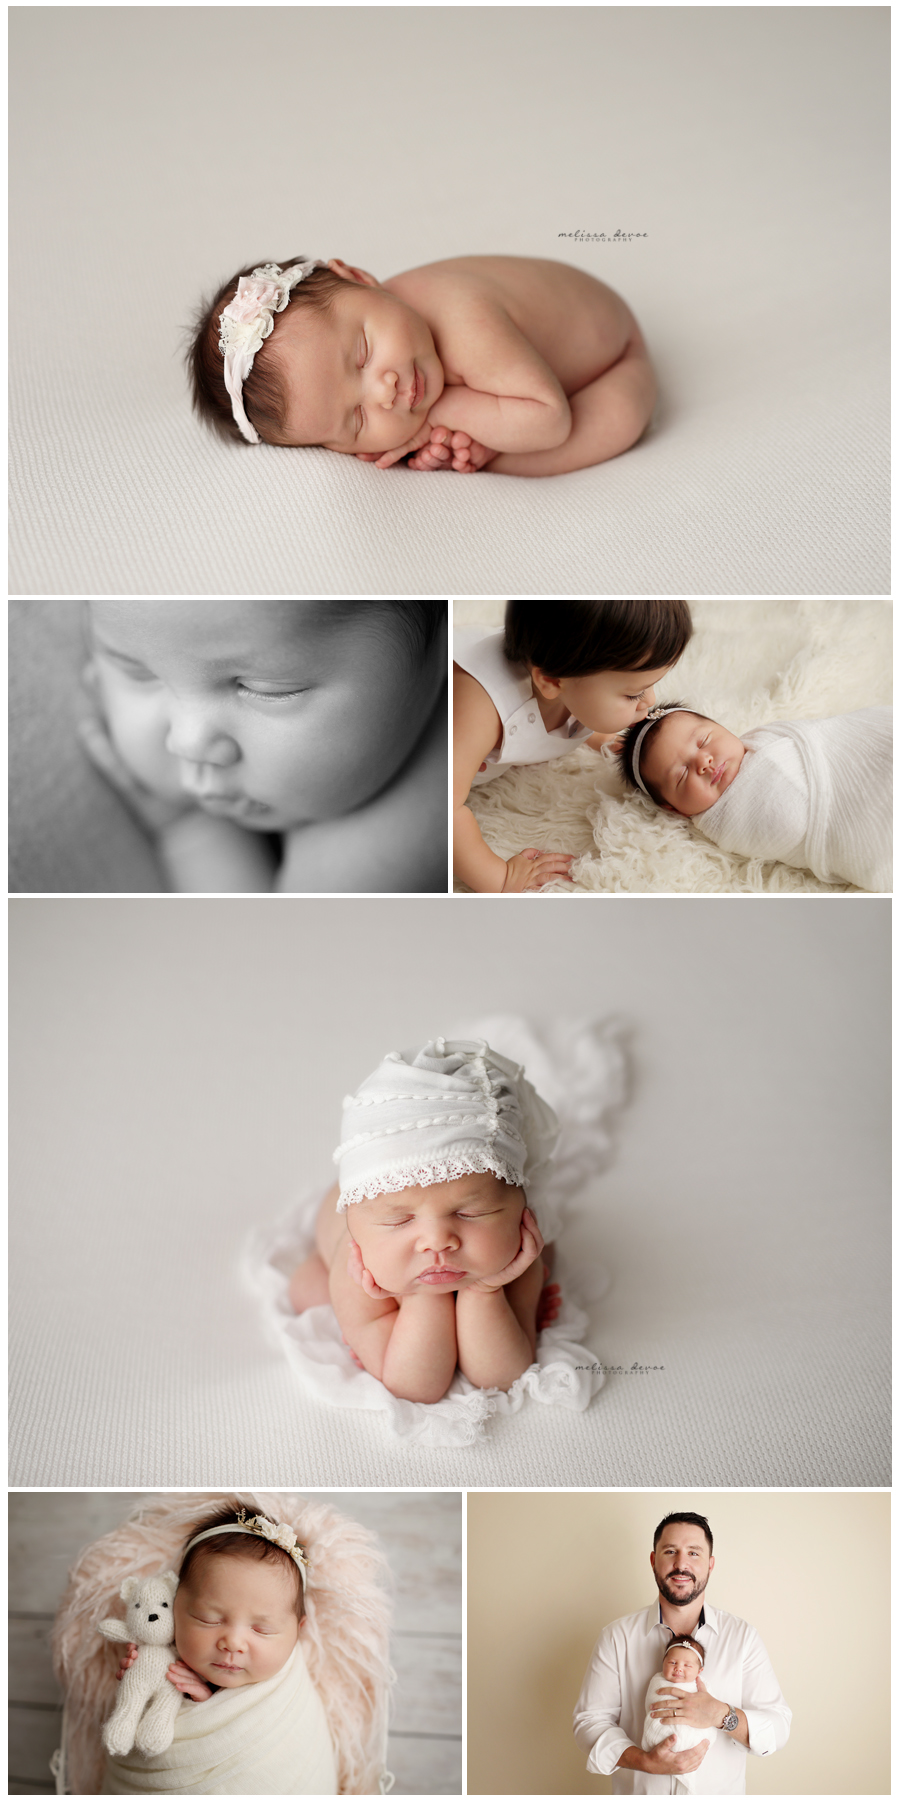 Baby and Sibling Photos